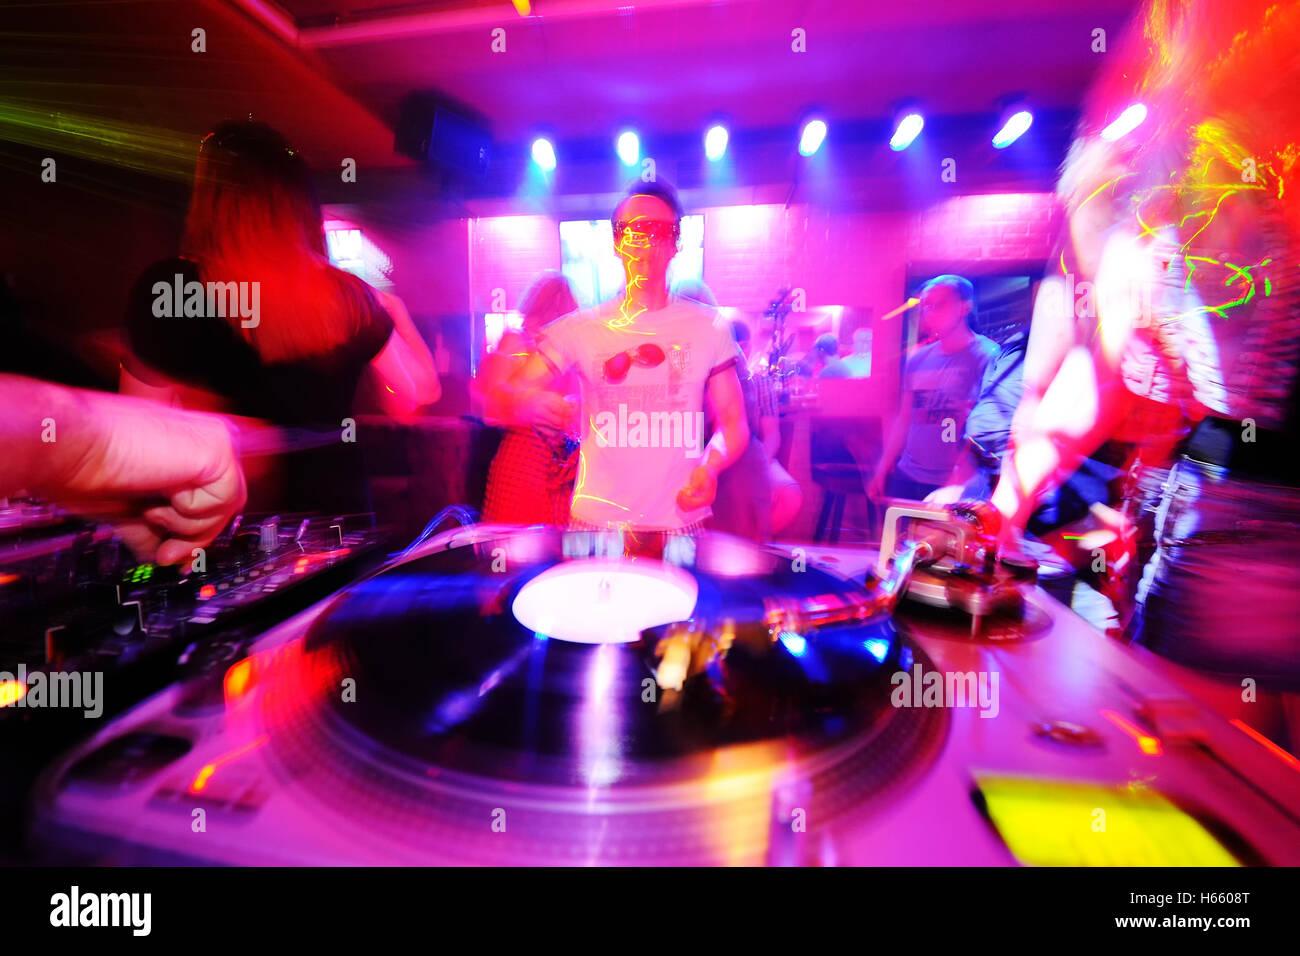 DJ behind the decks in a nightclub. - Stock Image